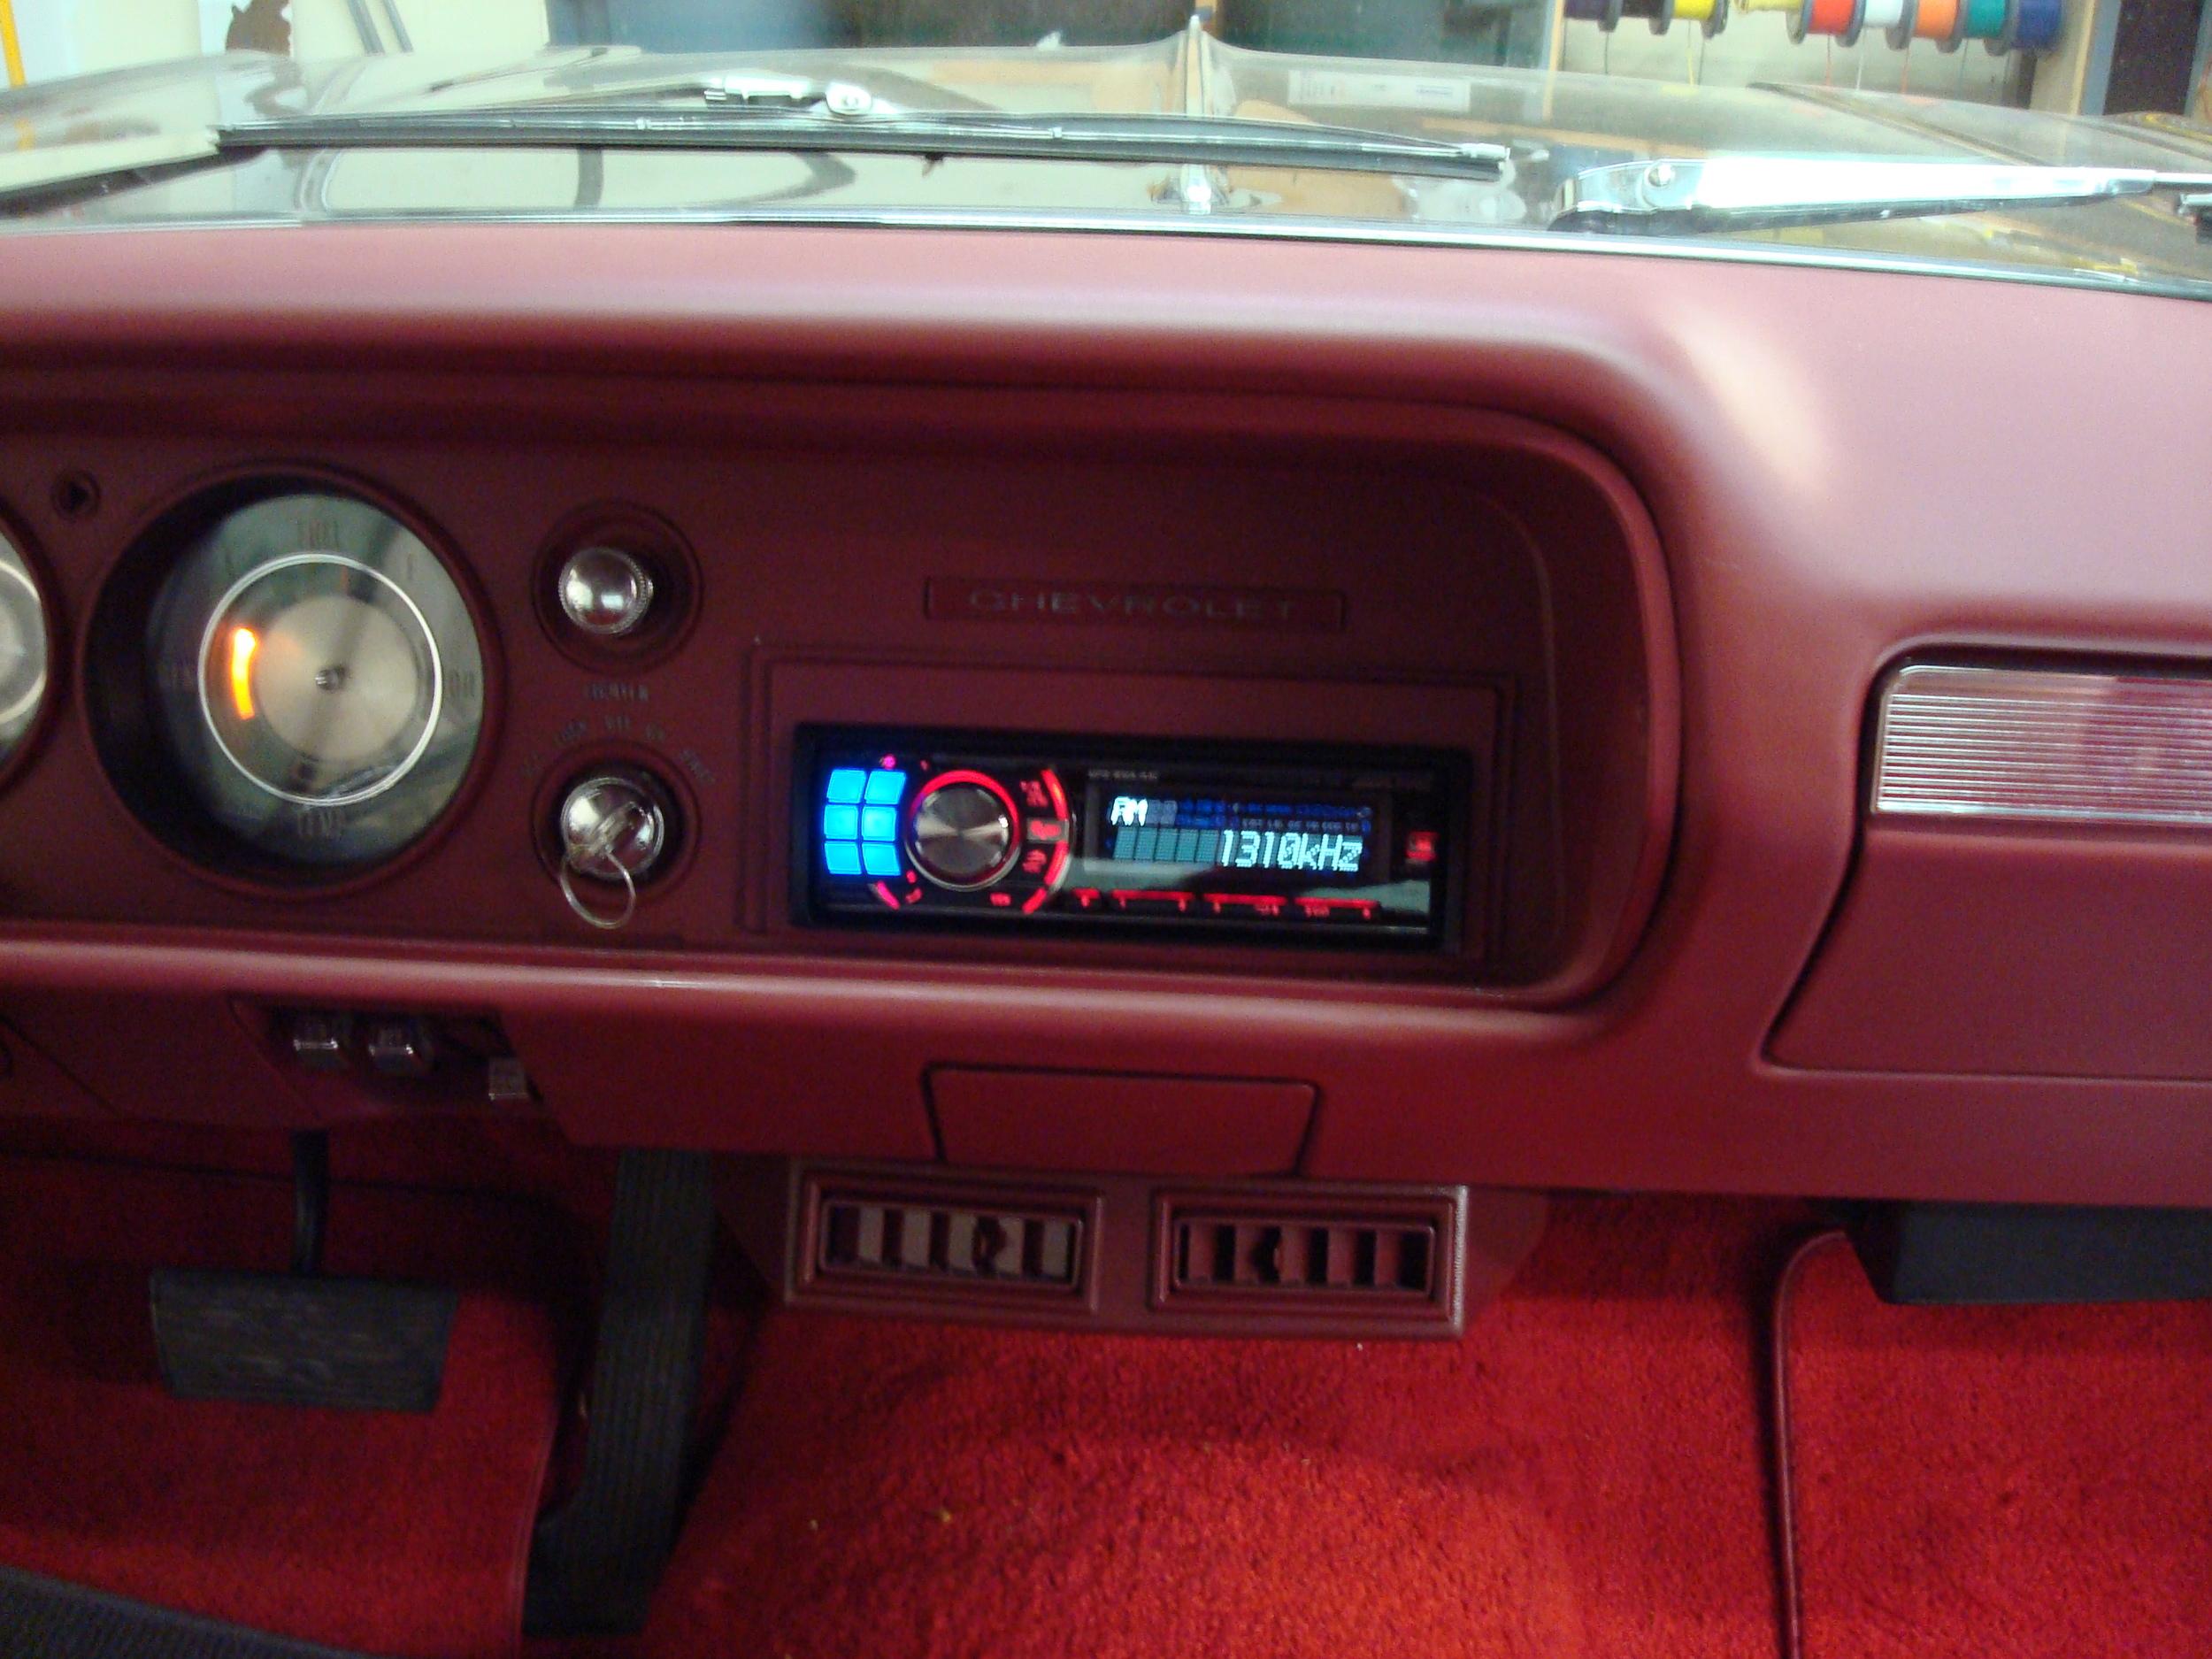 1964 Impala - Cut-In & Wire Alpine Head Unit